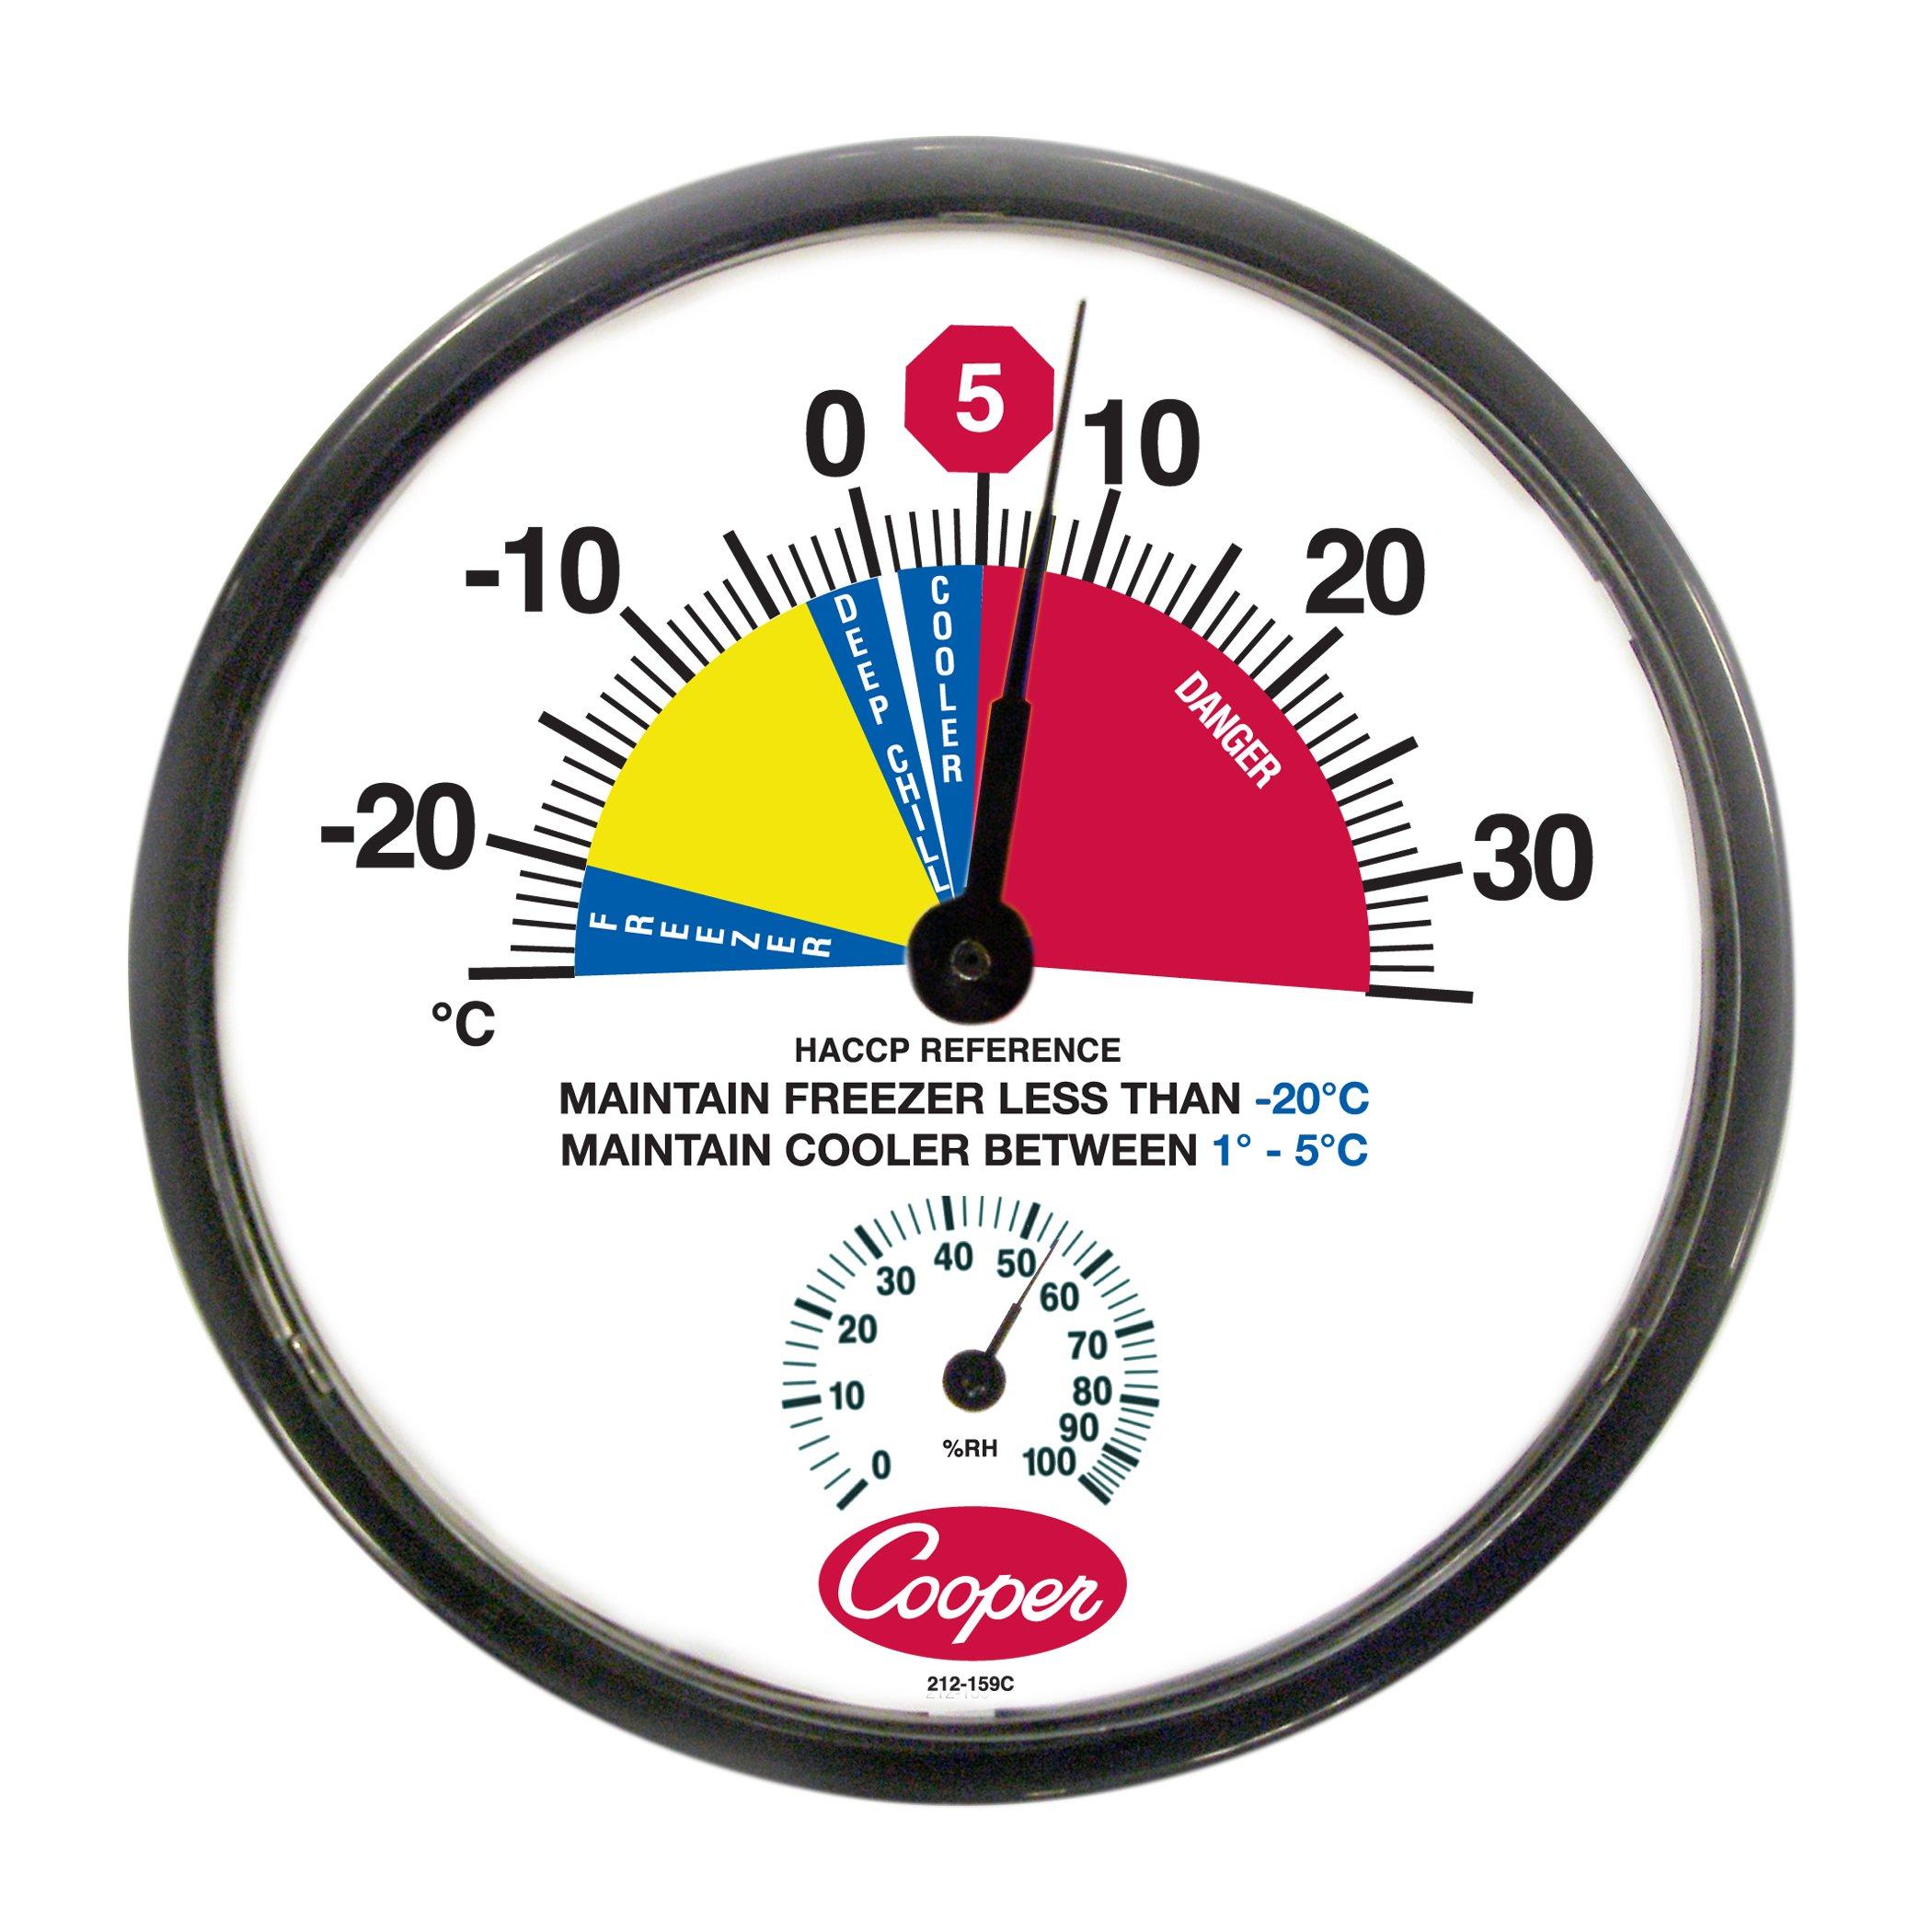 Cooper-Atkins 212-159C-8 Bi-Metals HACCP Cooler/Freezer Thermometer, -25 to 35 degrees C Temperature Range